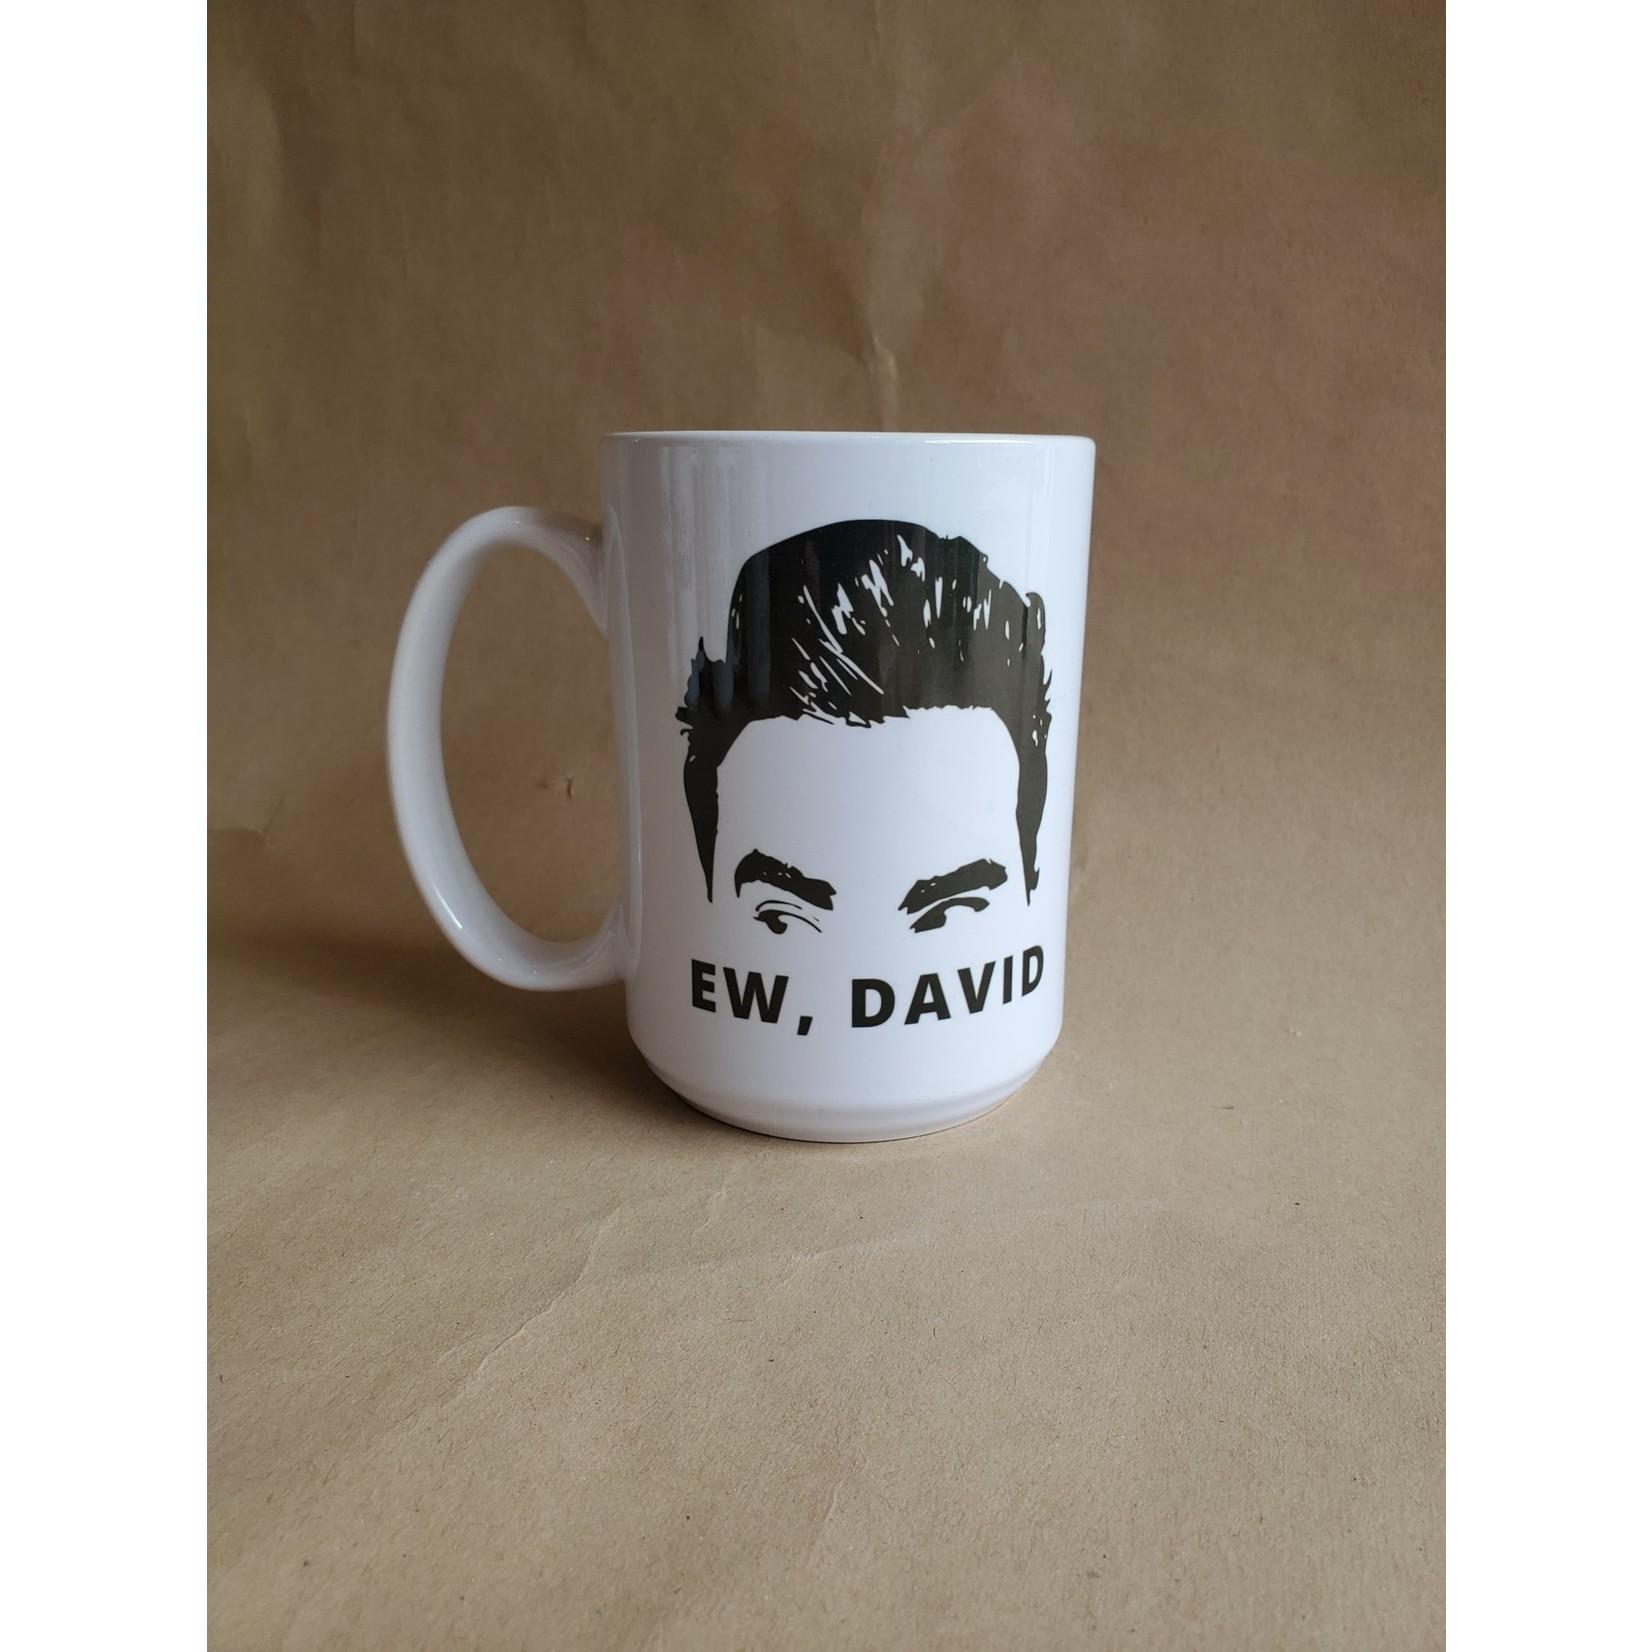 favourite things apparel Ew David mug (Schitt's Creek)